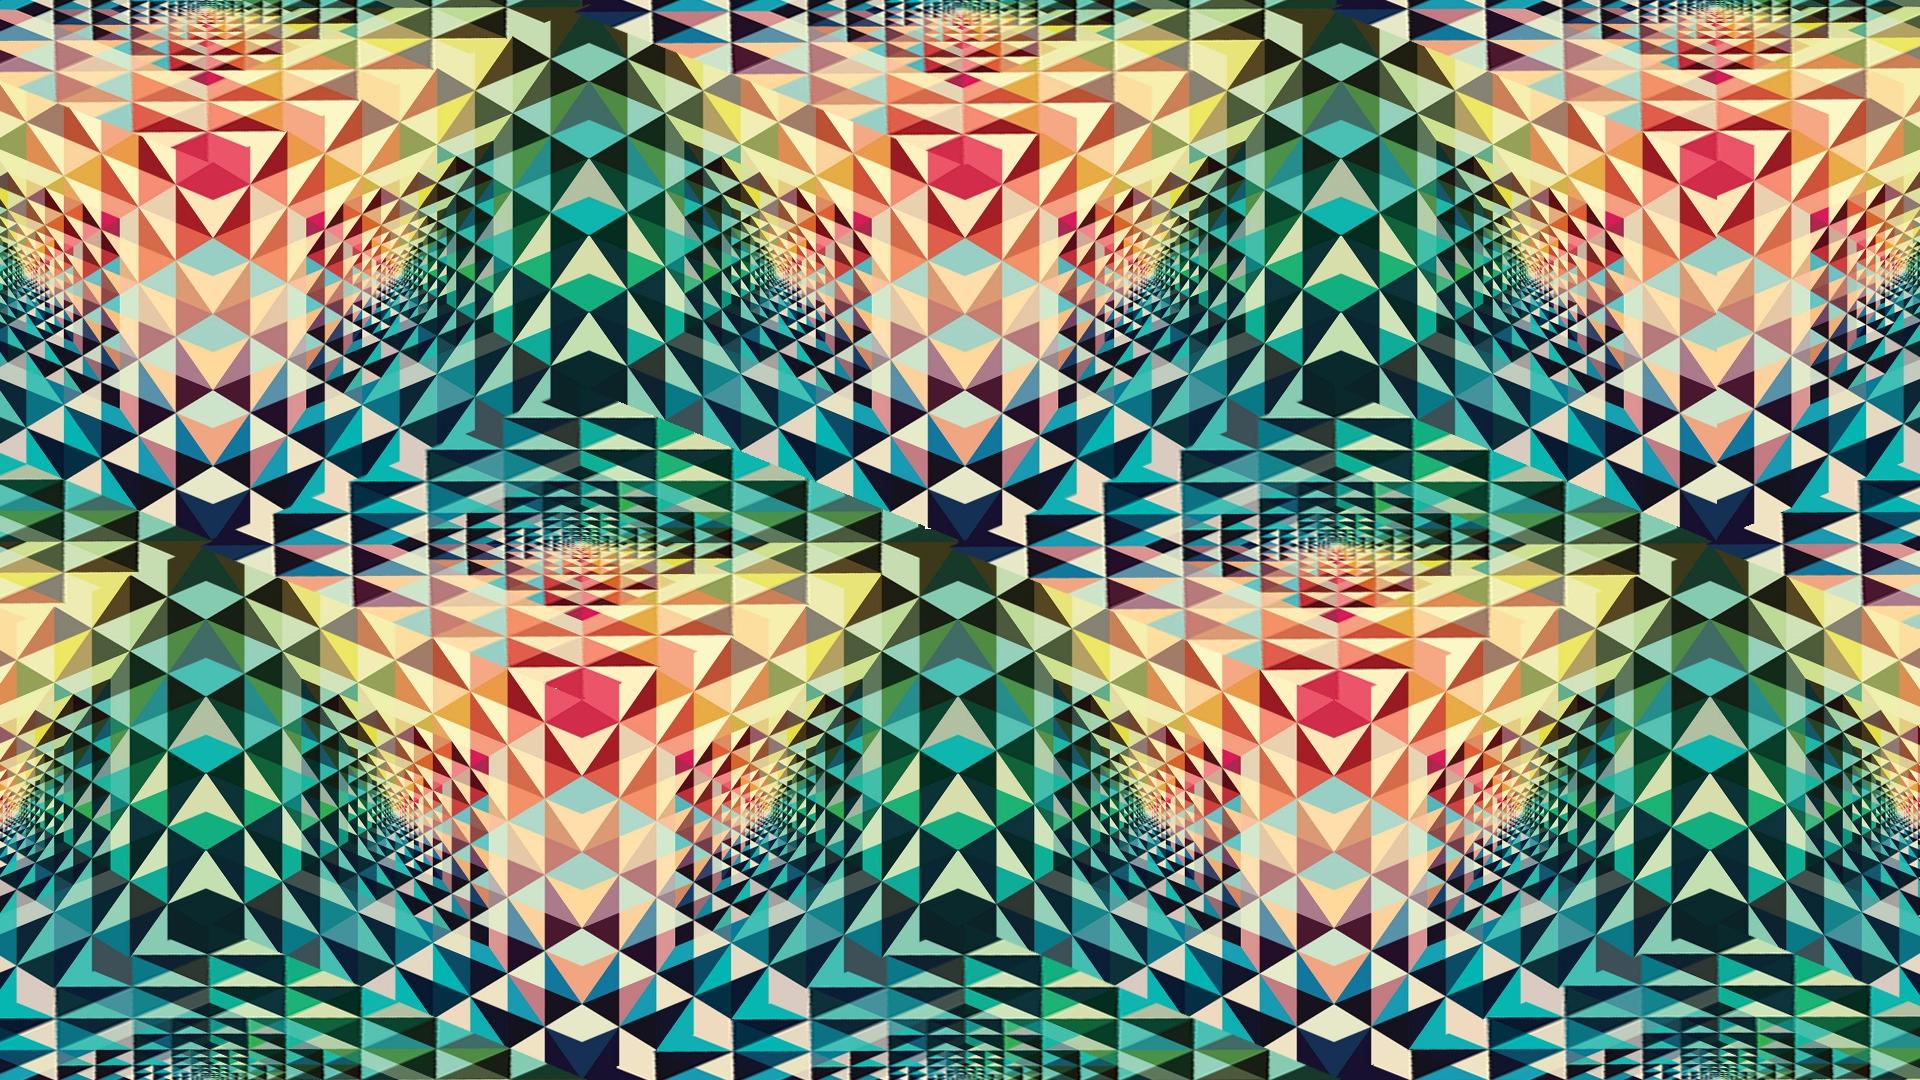 Kaleidoscope HD Widescreen Wallpaper - WallpaperSafari